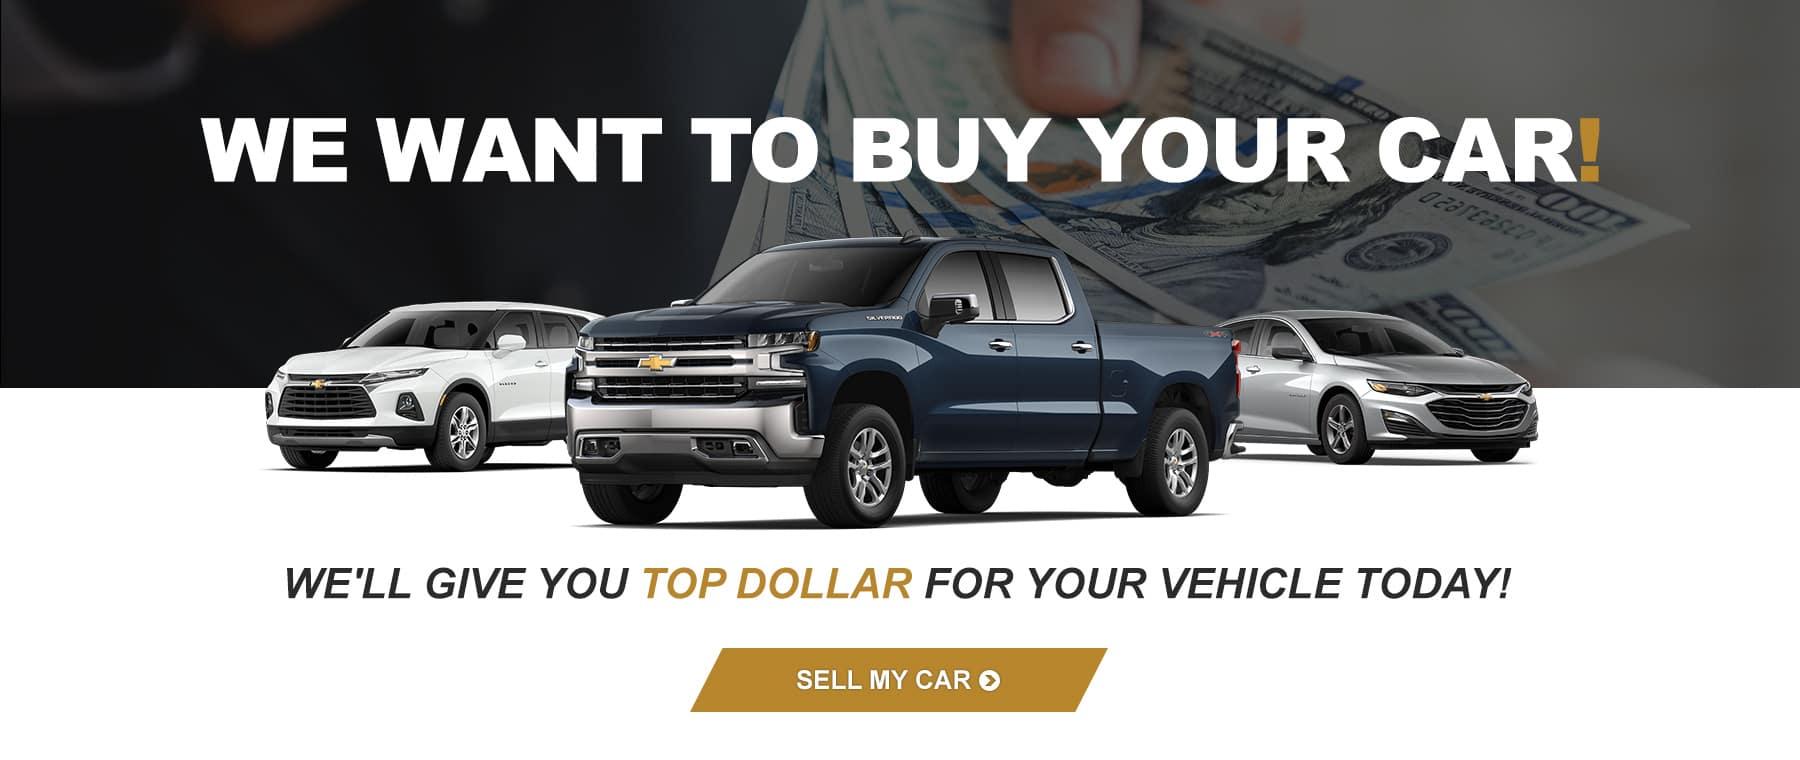 BuyCar-Slide-june-2021